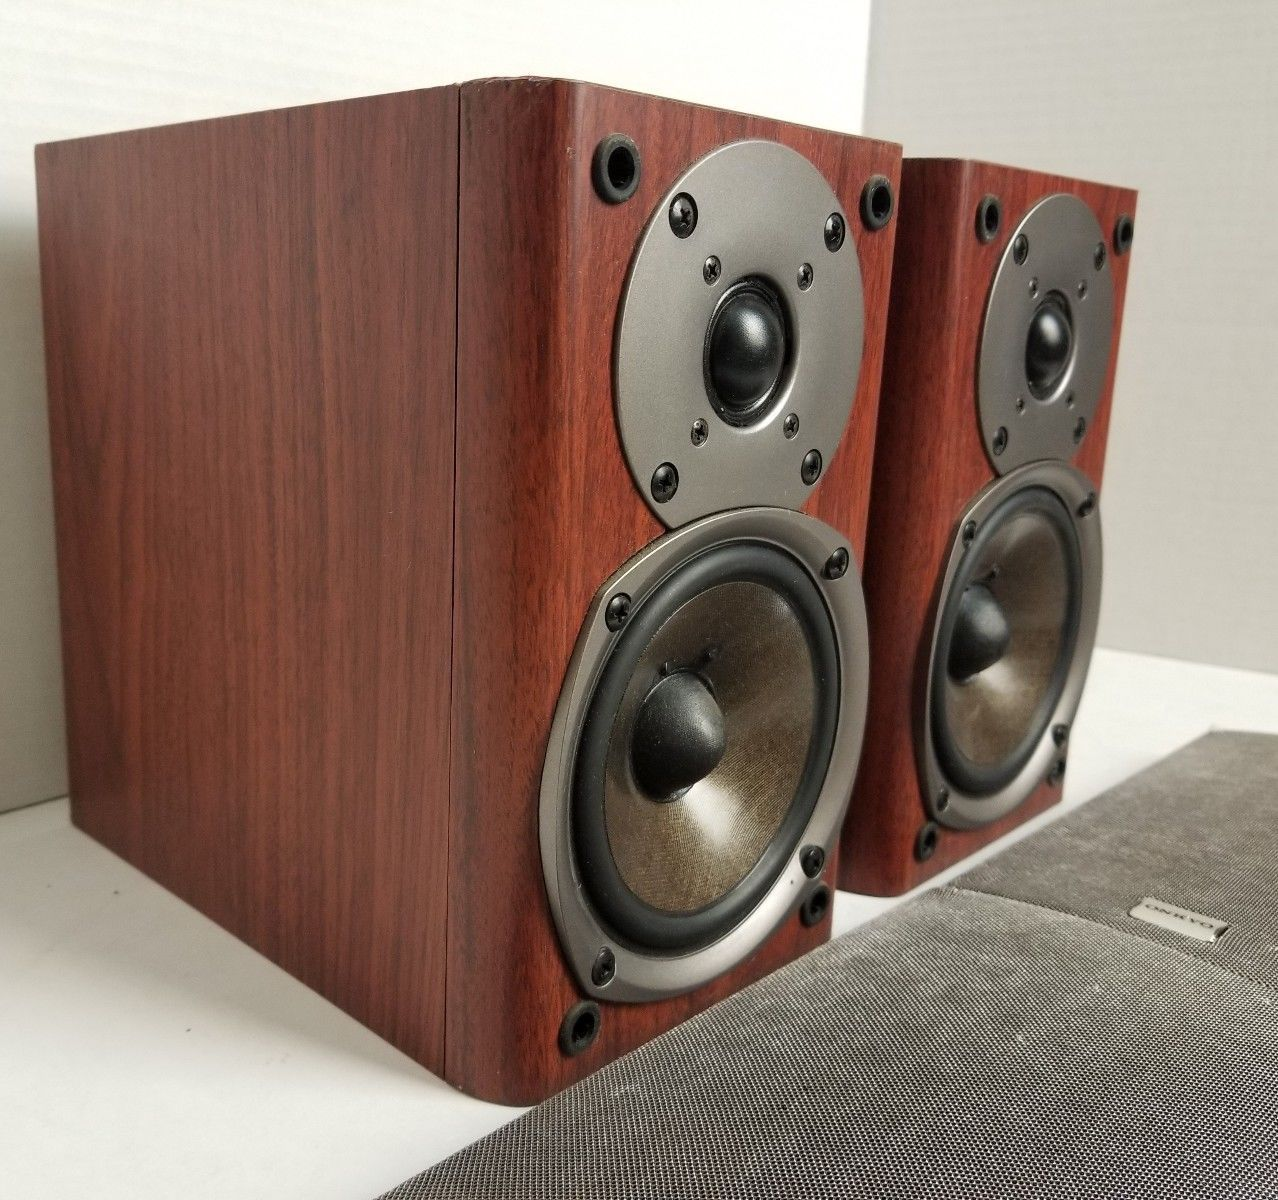 Onkyo DN3XA 70W Bookshelf Stereo Speakers Stereo